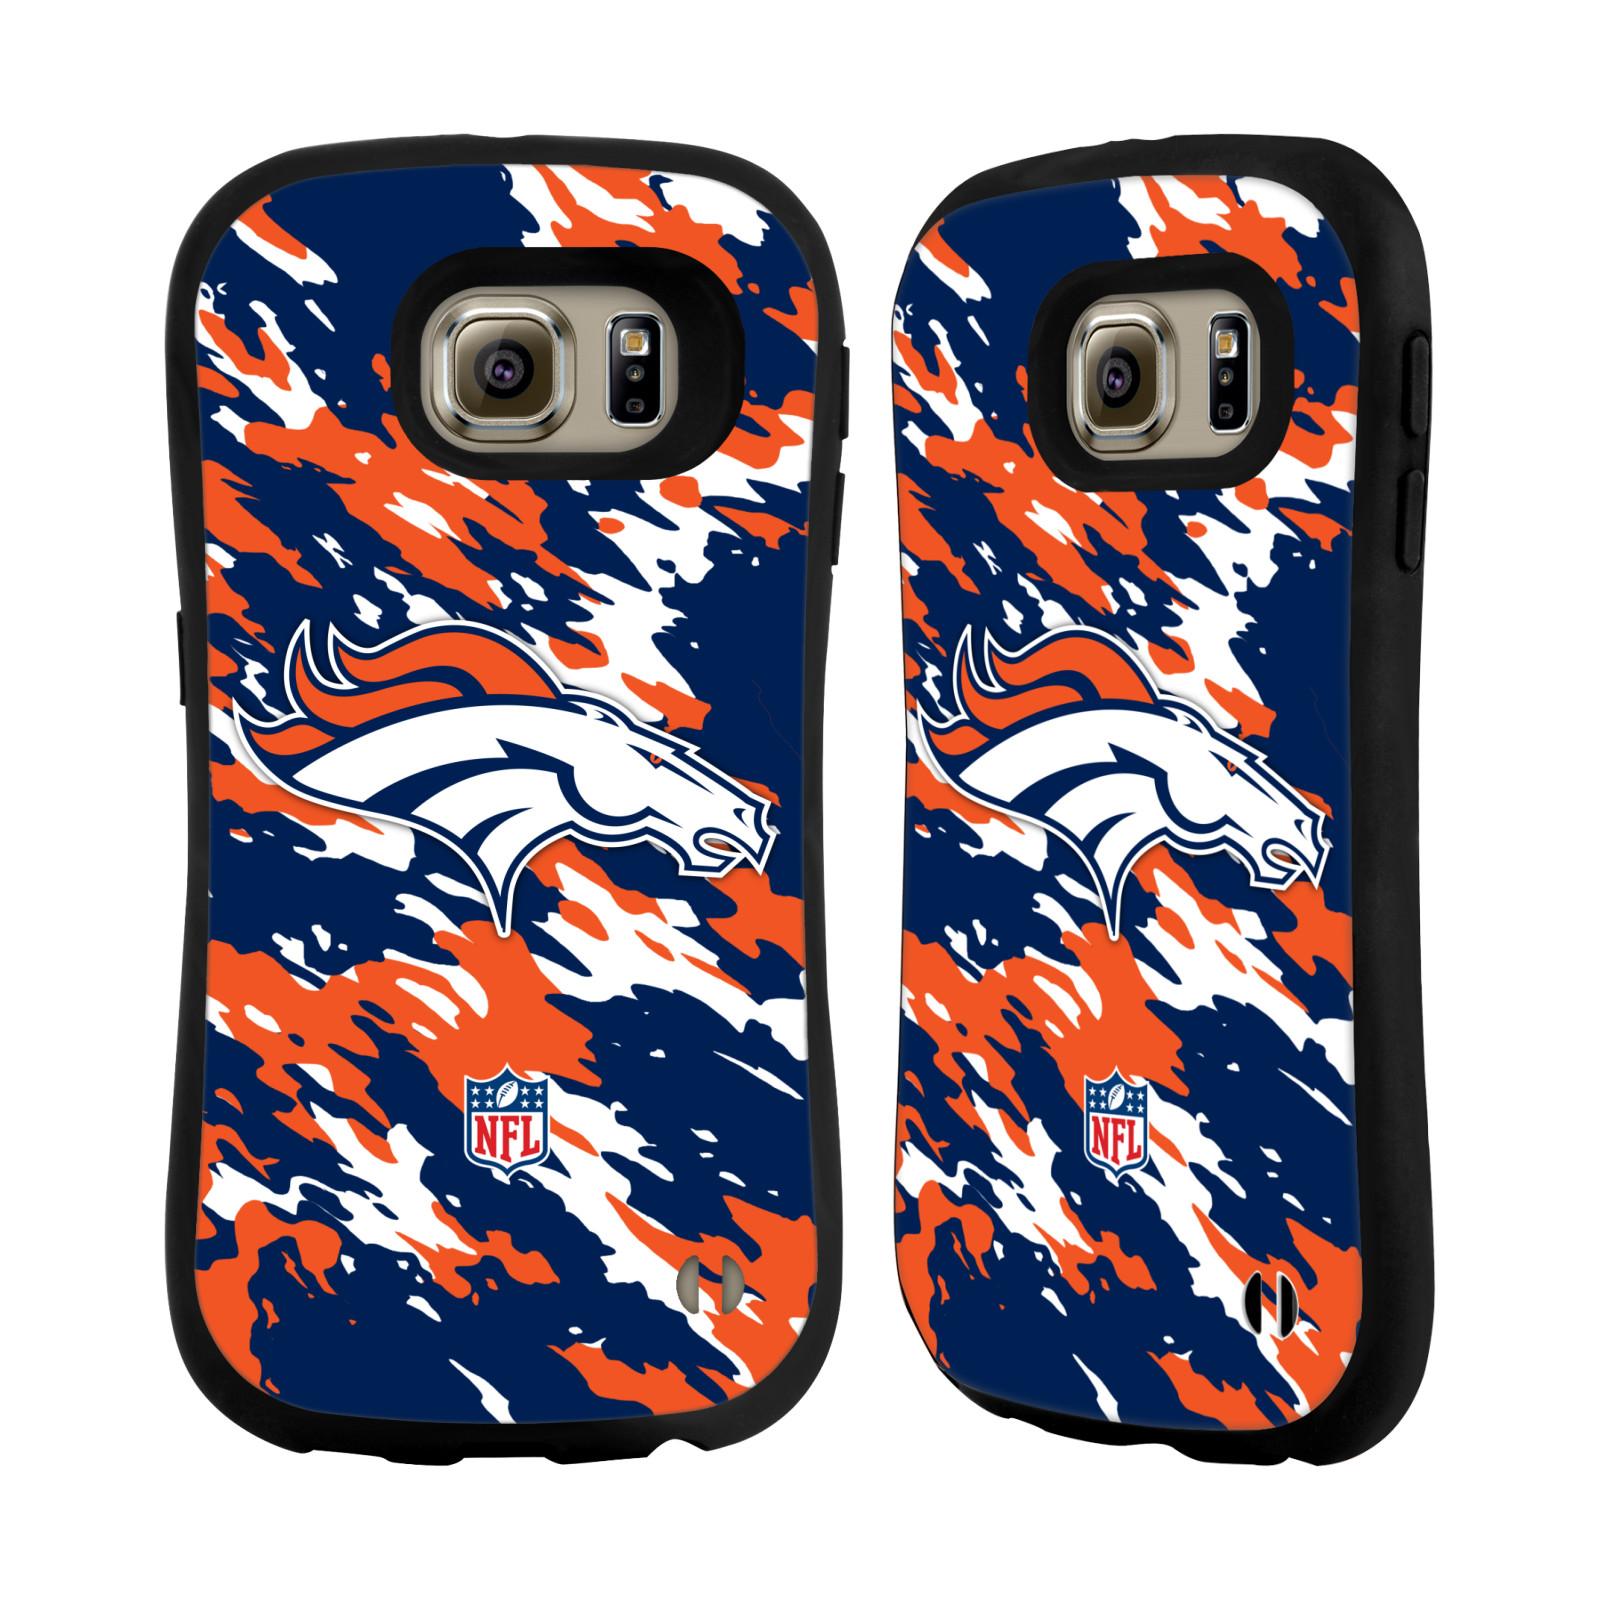 Denver Broncos: OFFICIAL NFL DENVER BRONCOS LOGO HYBRID CASE FOR SAMSUNG